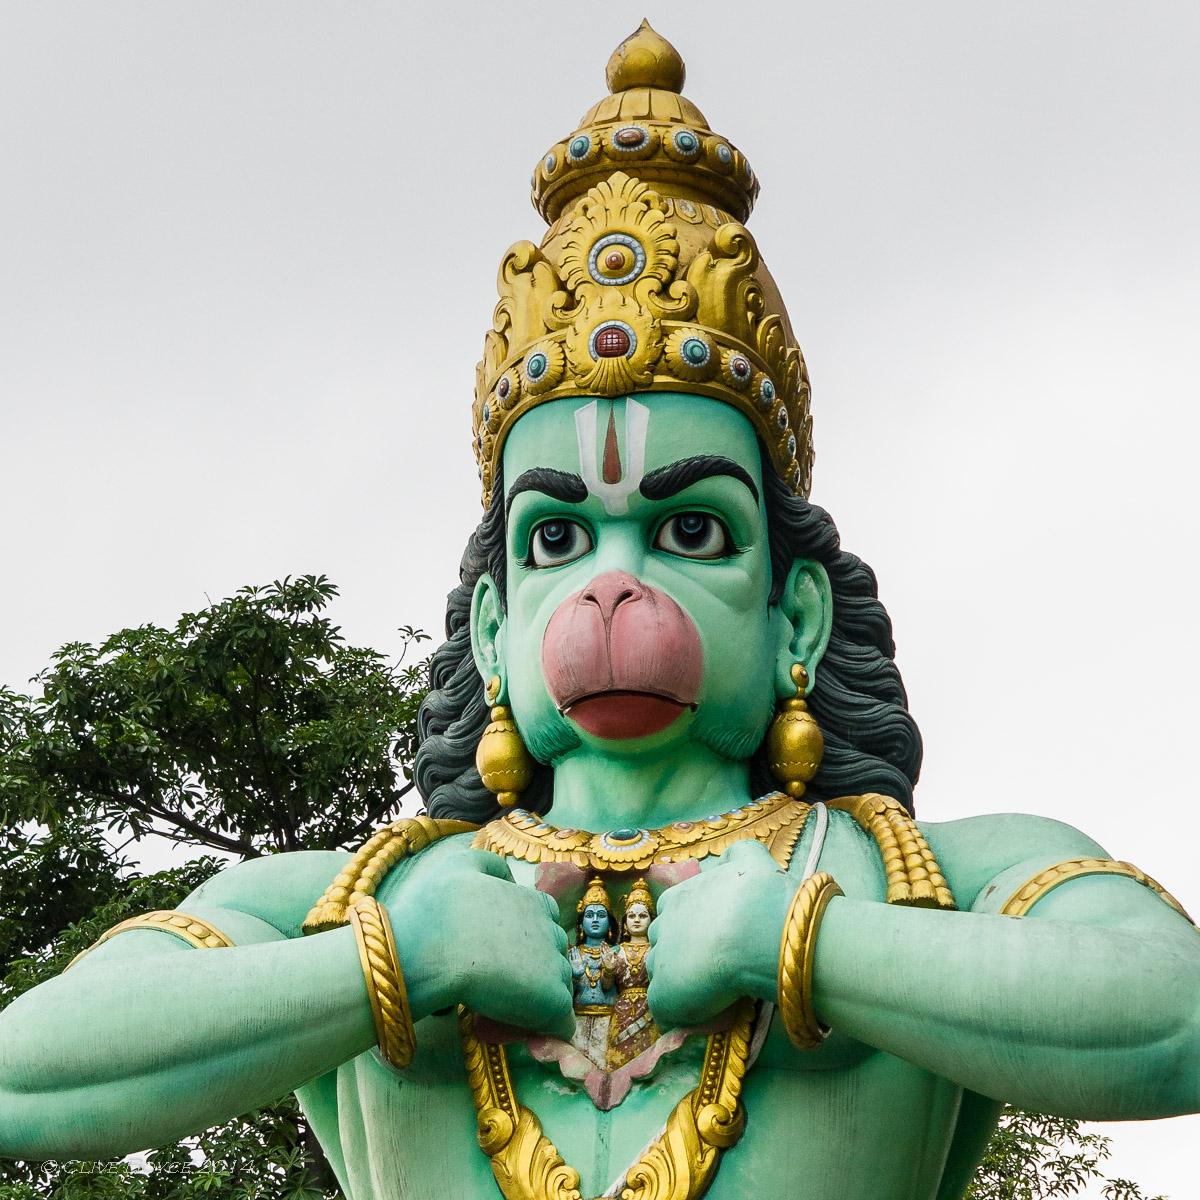 Hanuman staute, Batu Cave